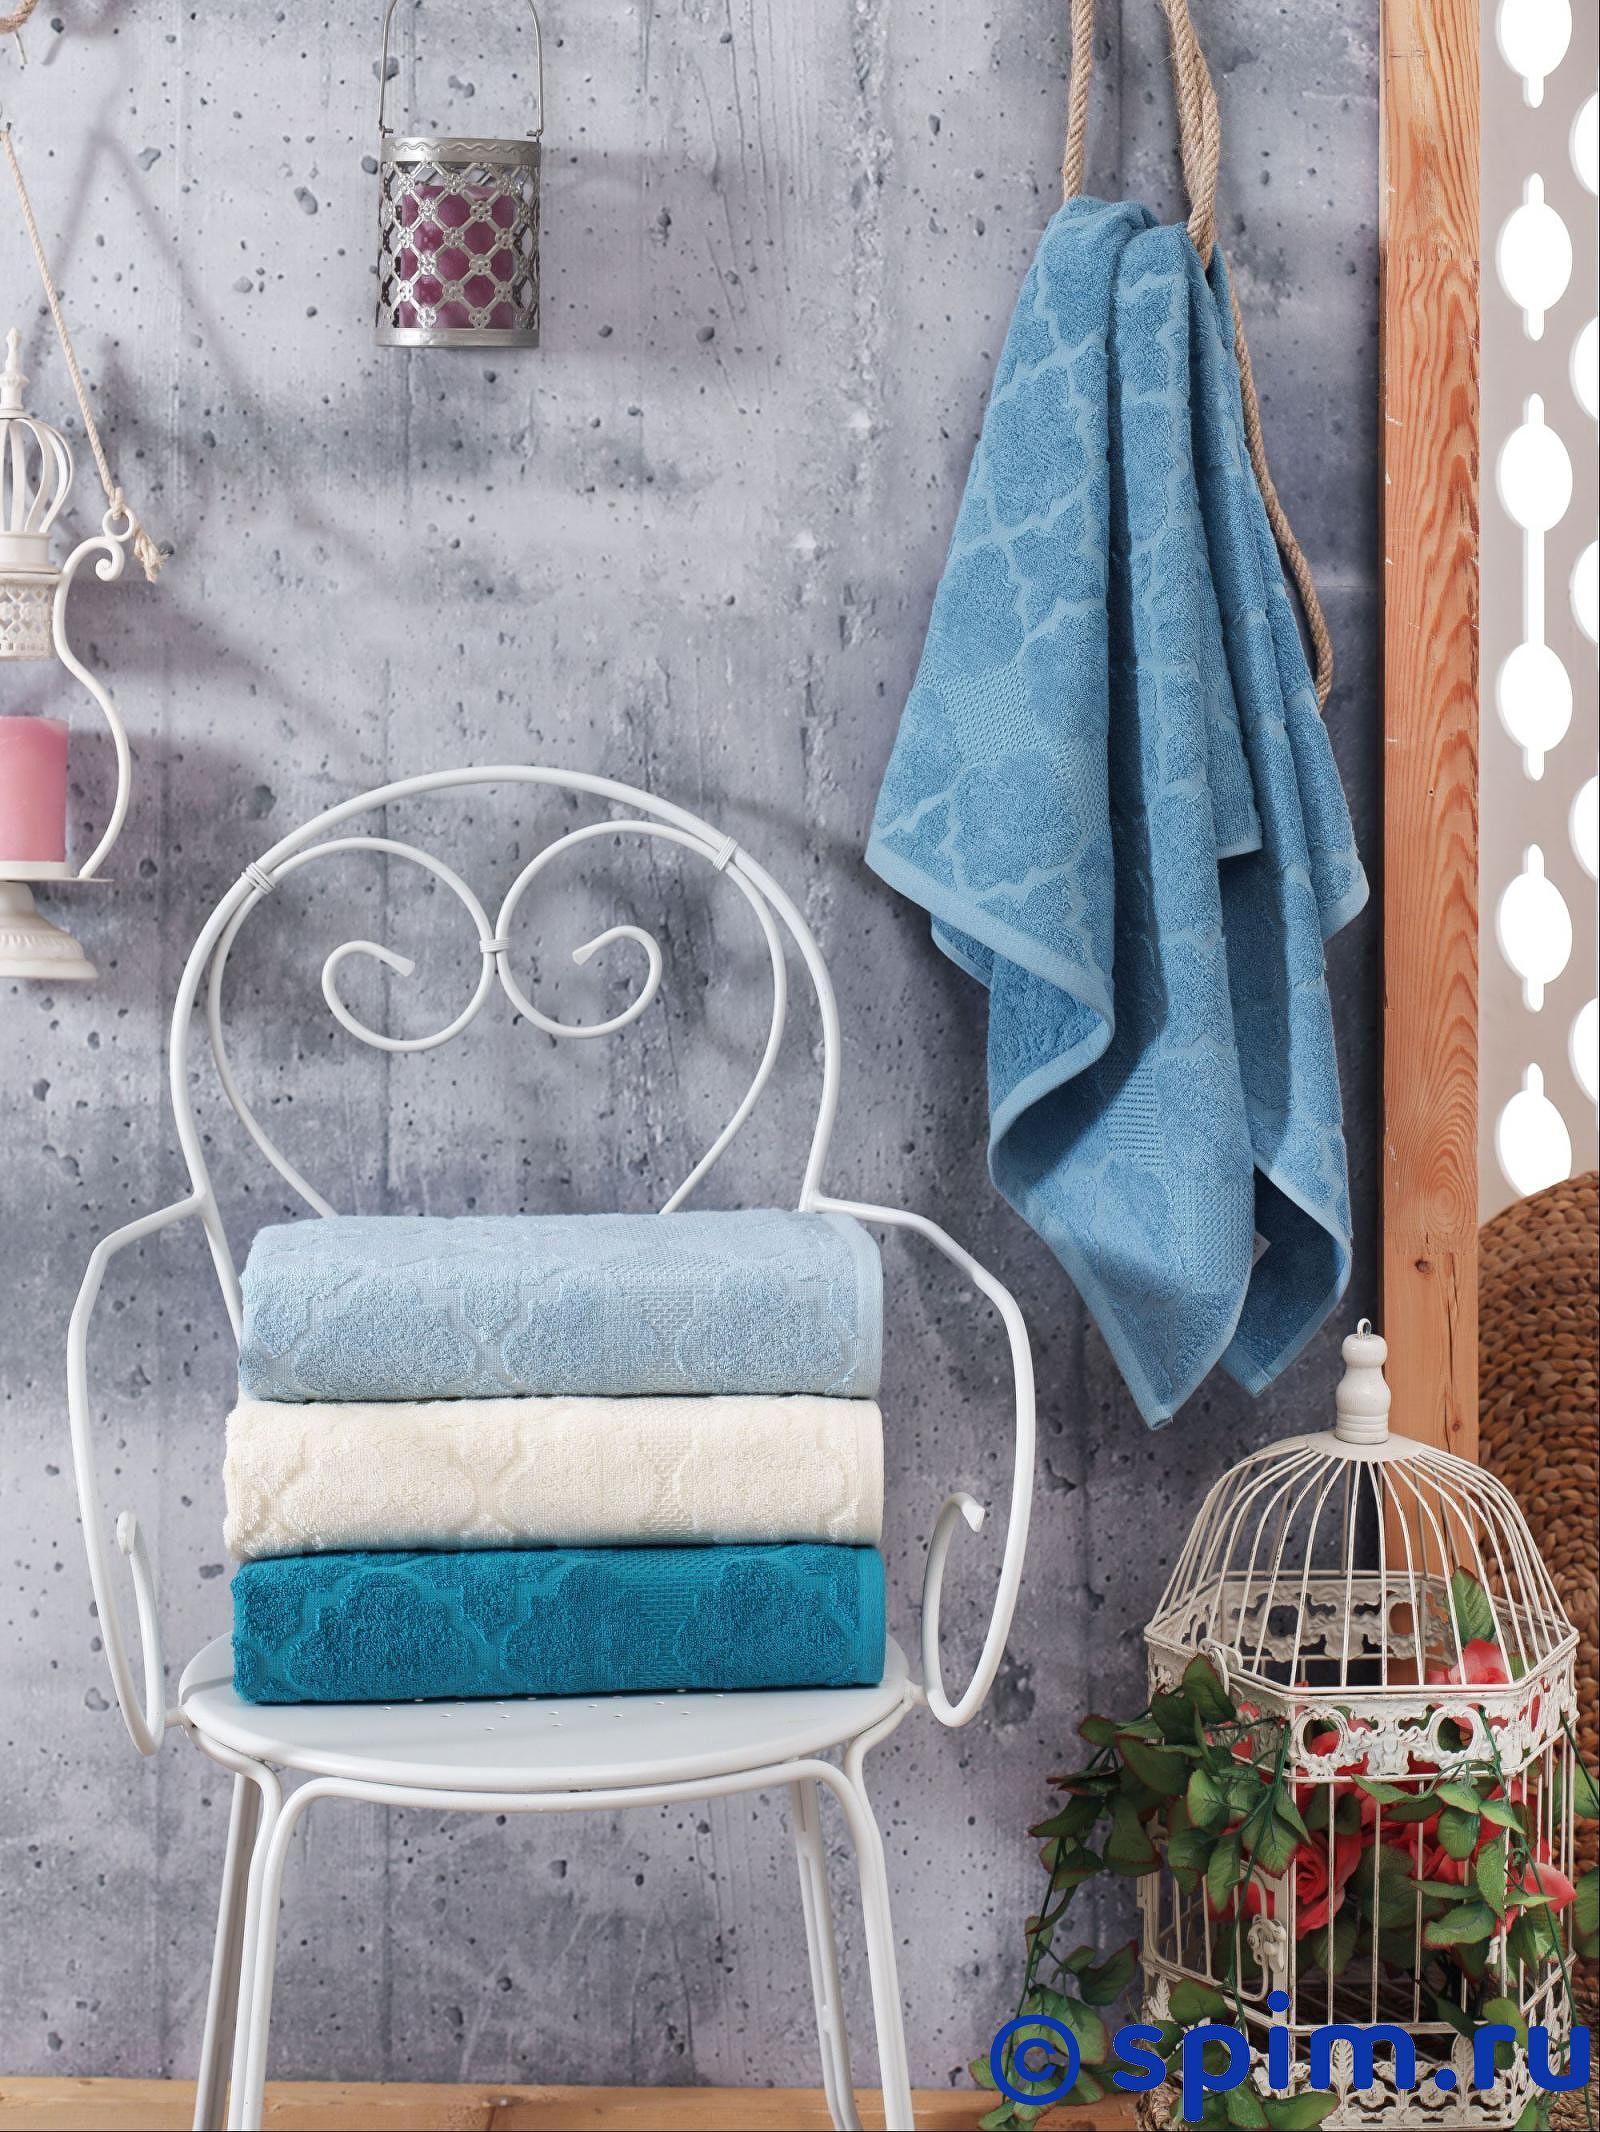 Набор из 4-х полотенец Do&co Crystar 50х90 см полотенца do n co полотенце lady цвет мятный набор